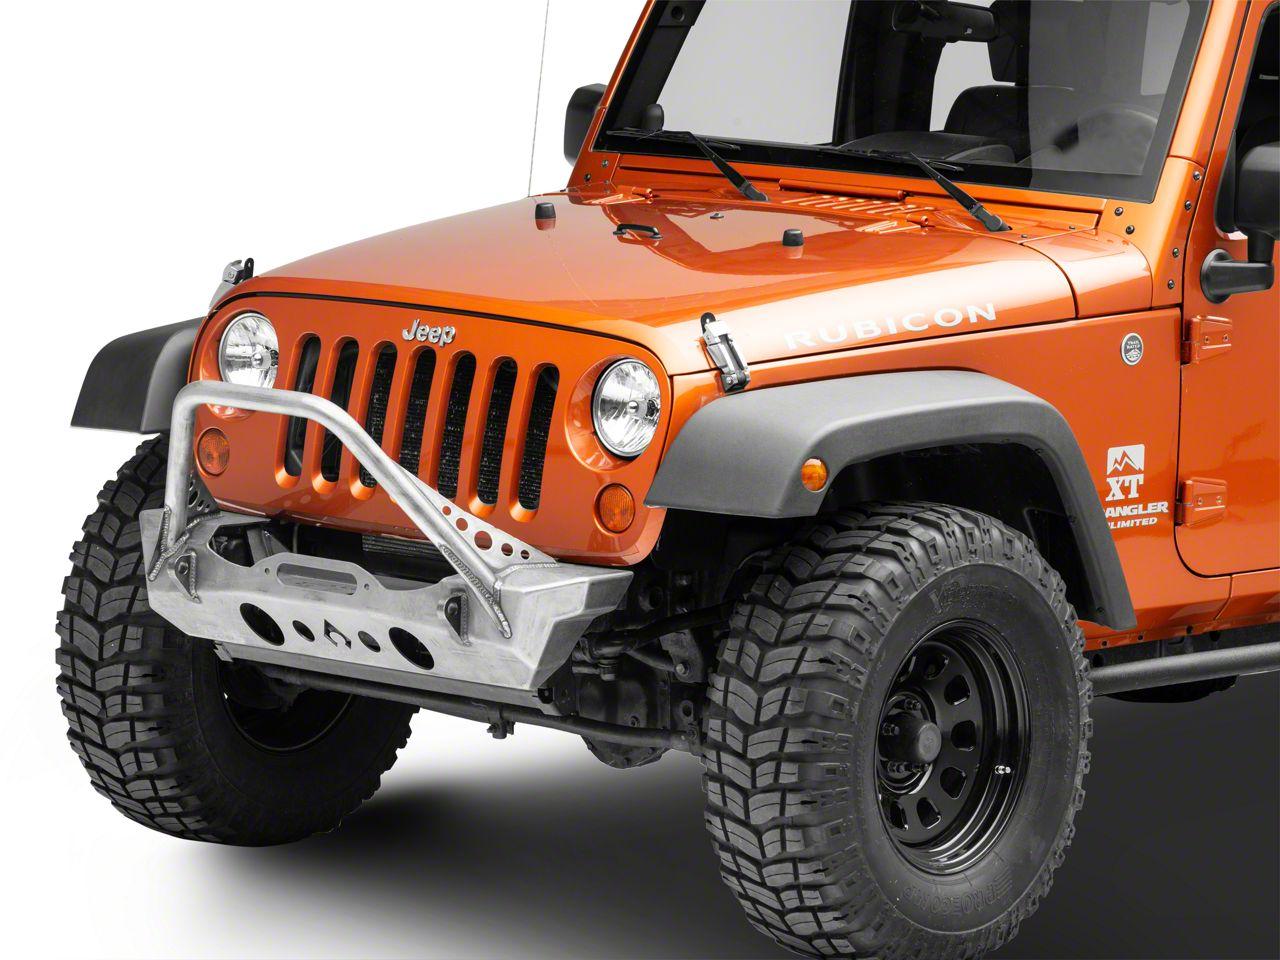 Artec Industries Nighthawk Front Bumper w/ Mid-Tube Stinger (07-18 Jeep Wrangler JK)